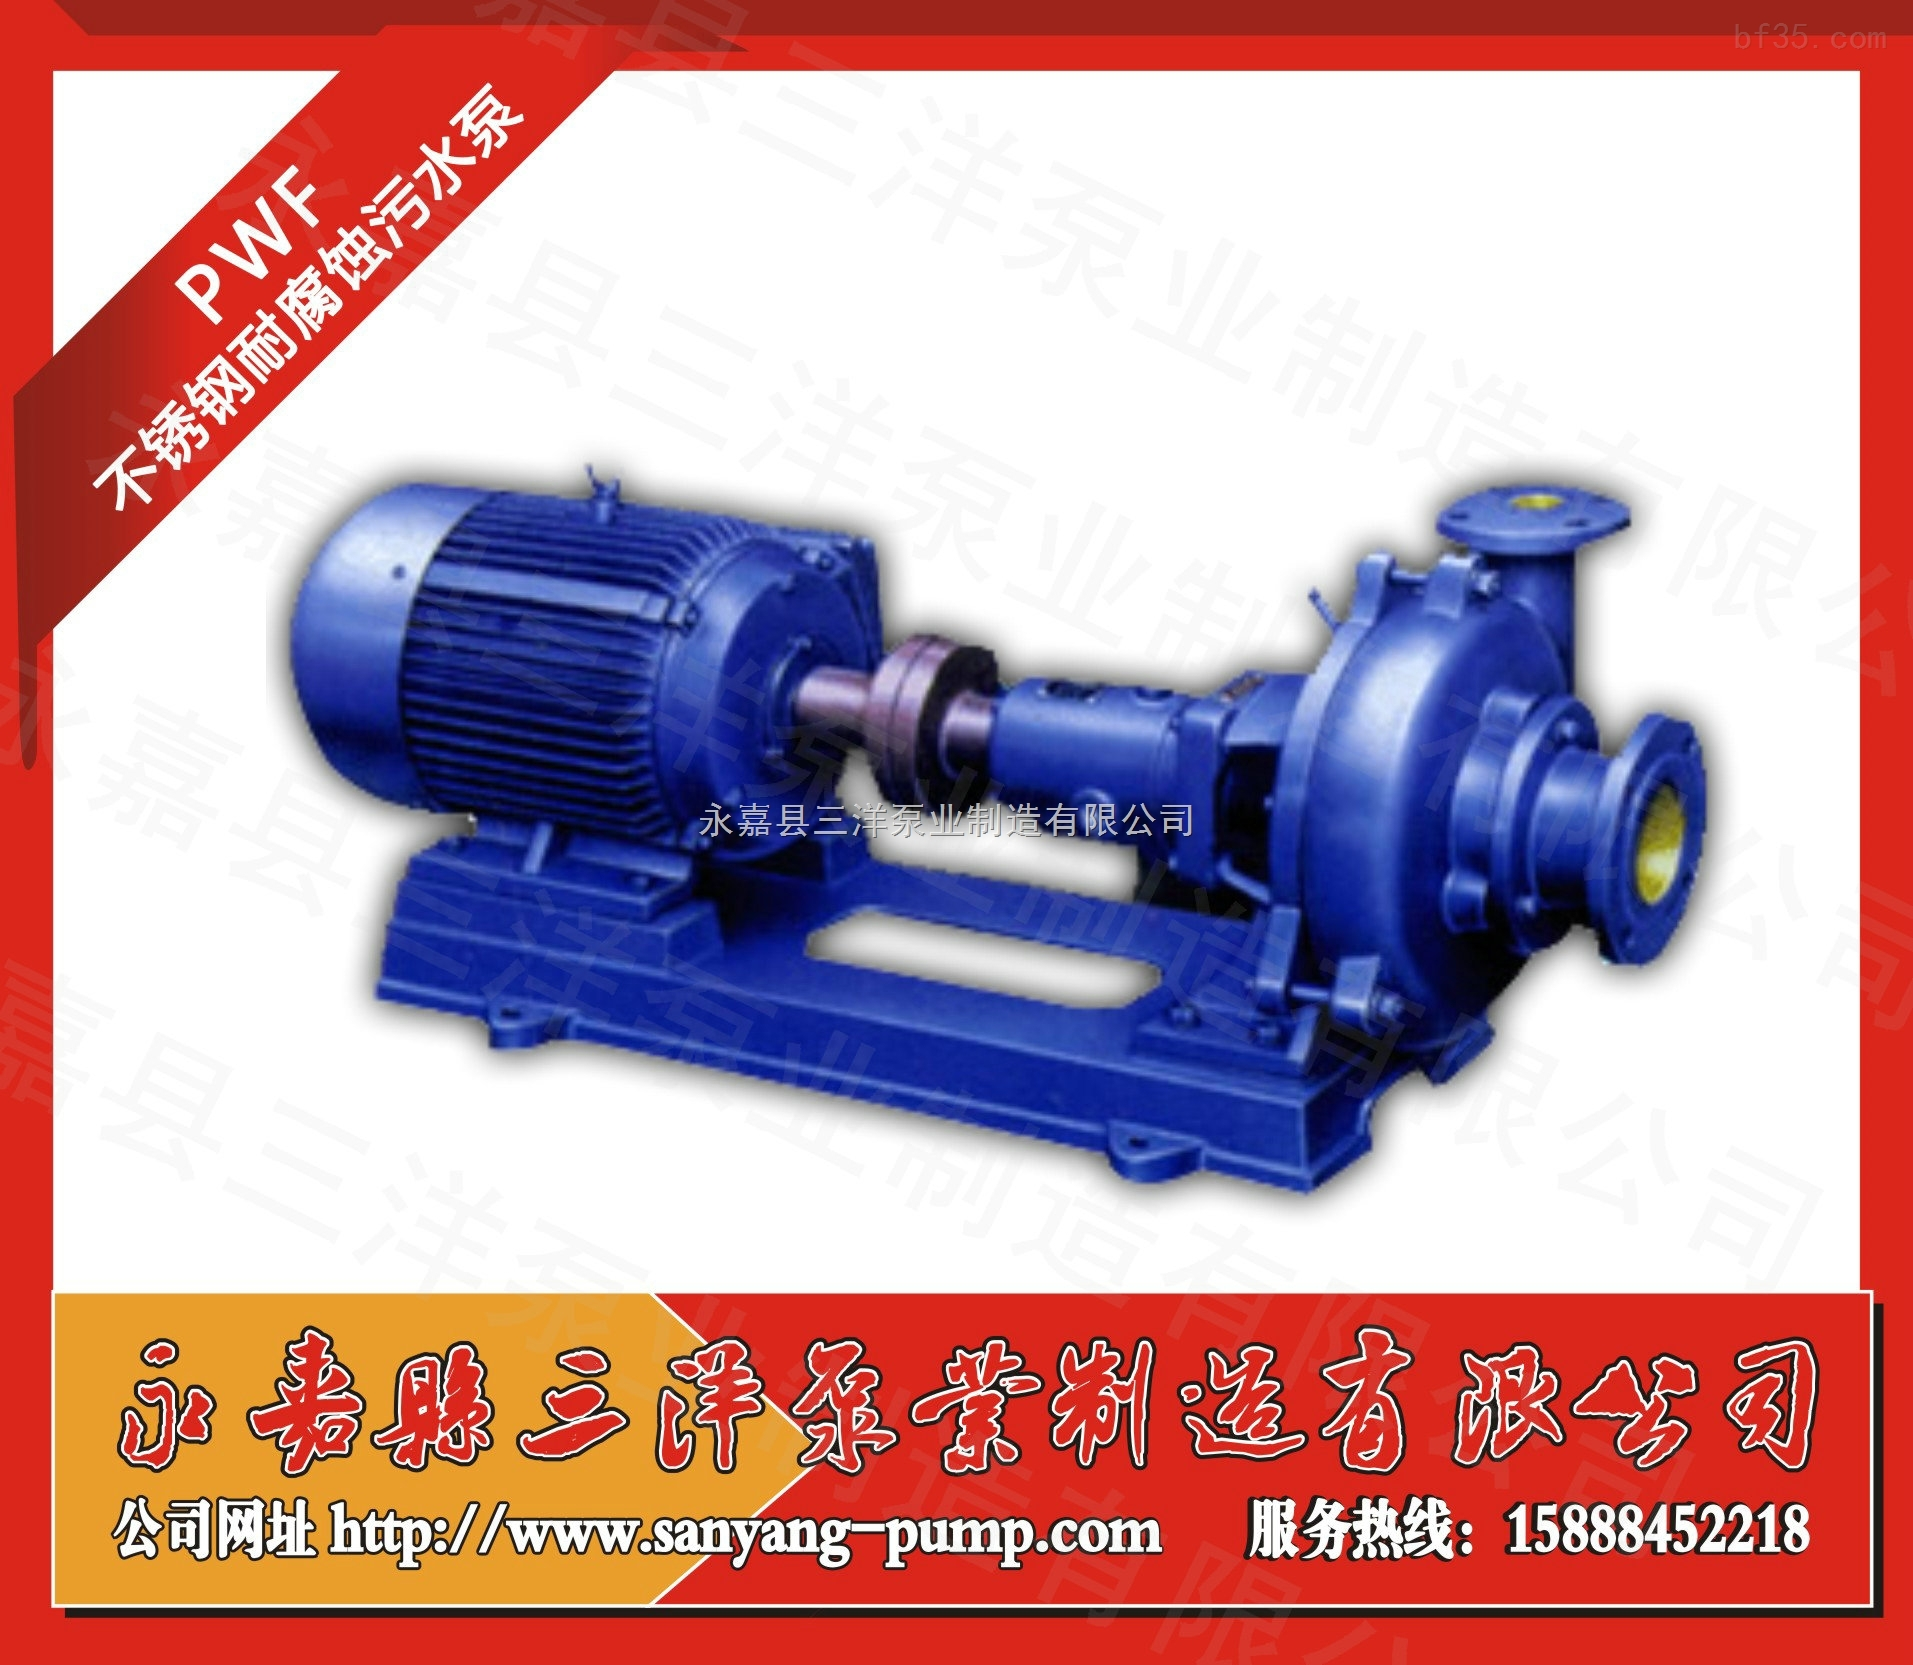 pwf耐腐蚀污水泵型号意义:pwf耐腐蚀污水泵结构说明